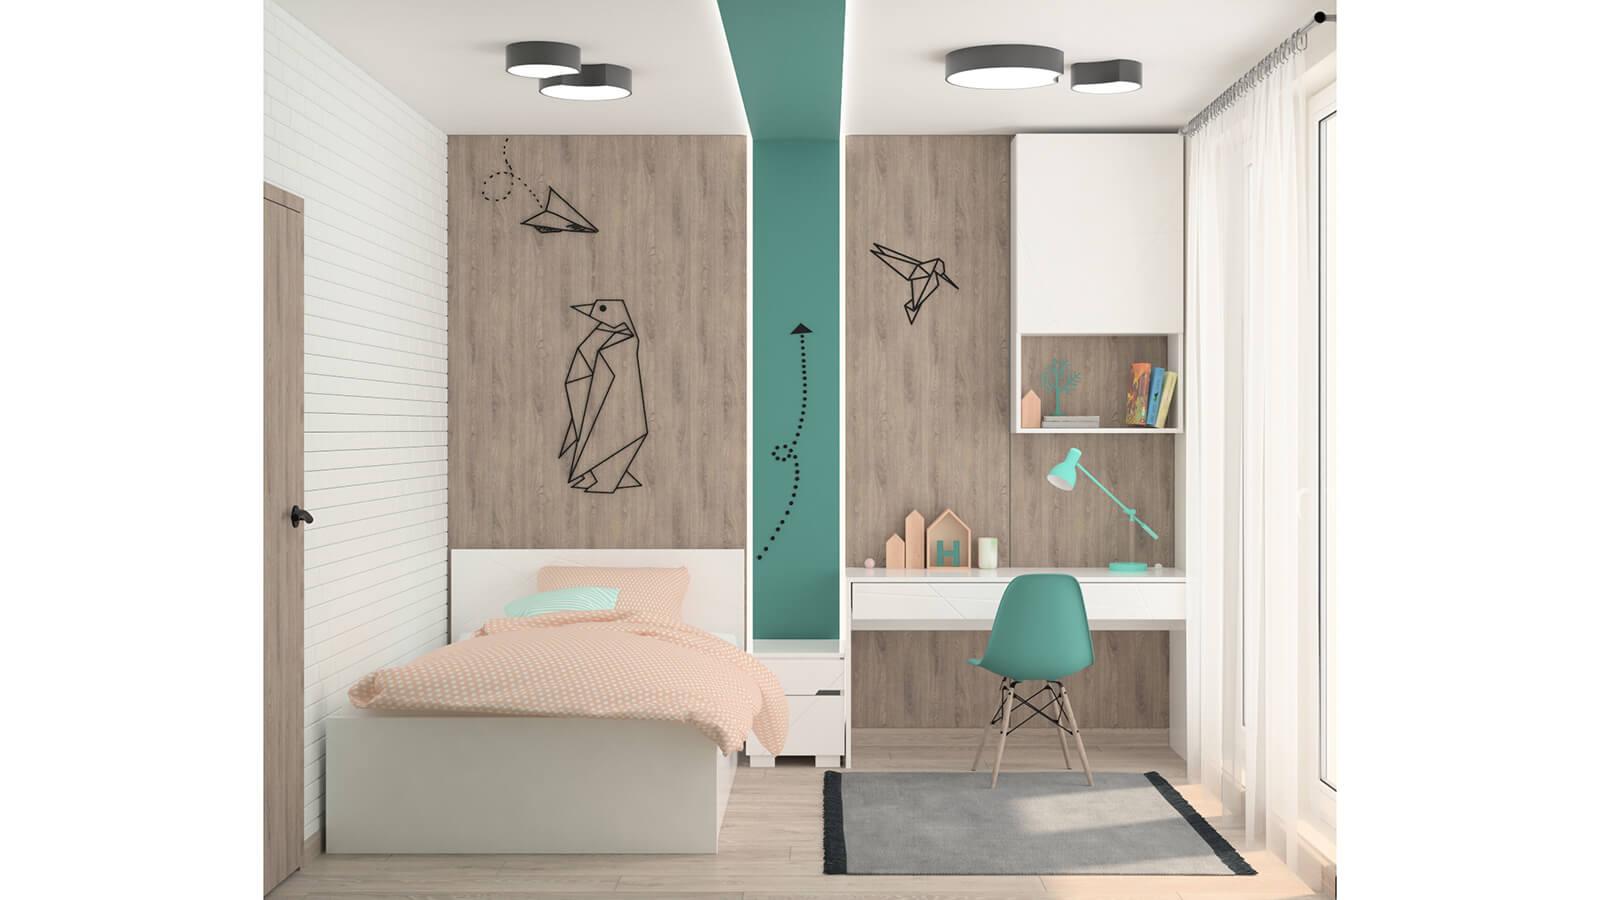 dizain-interioren-proekt-na-detska-staia-esteta-design (1)